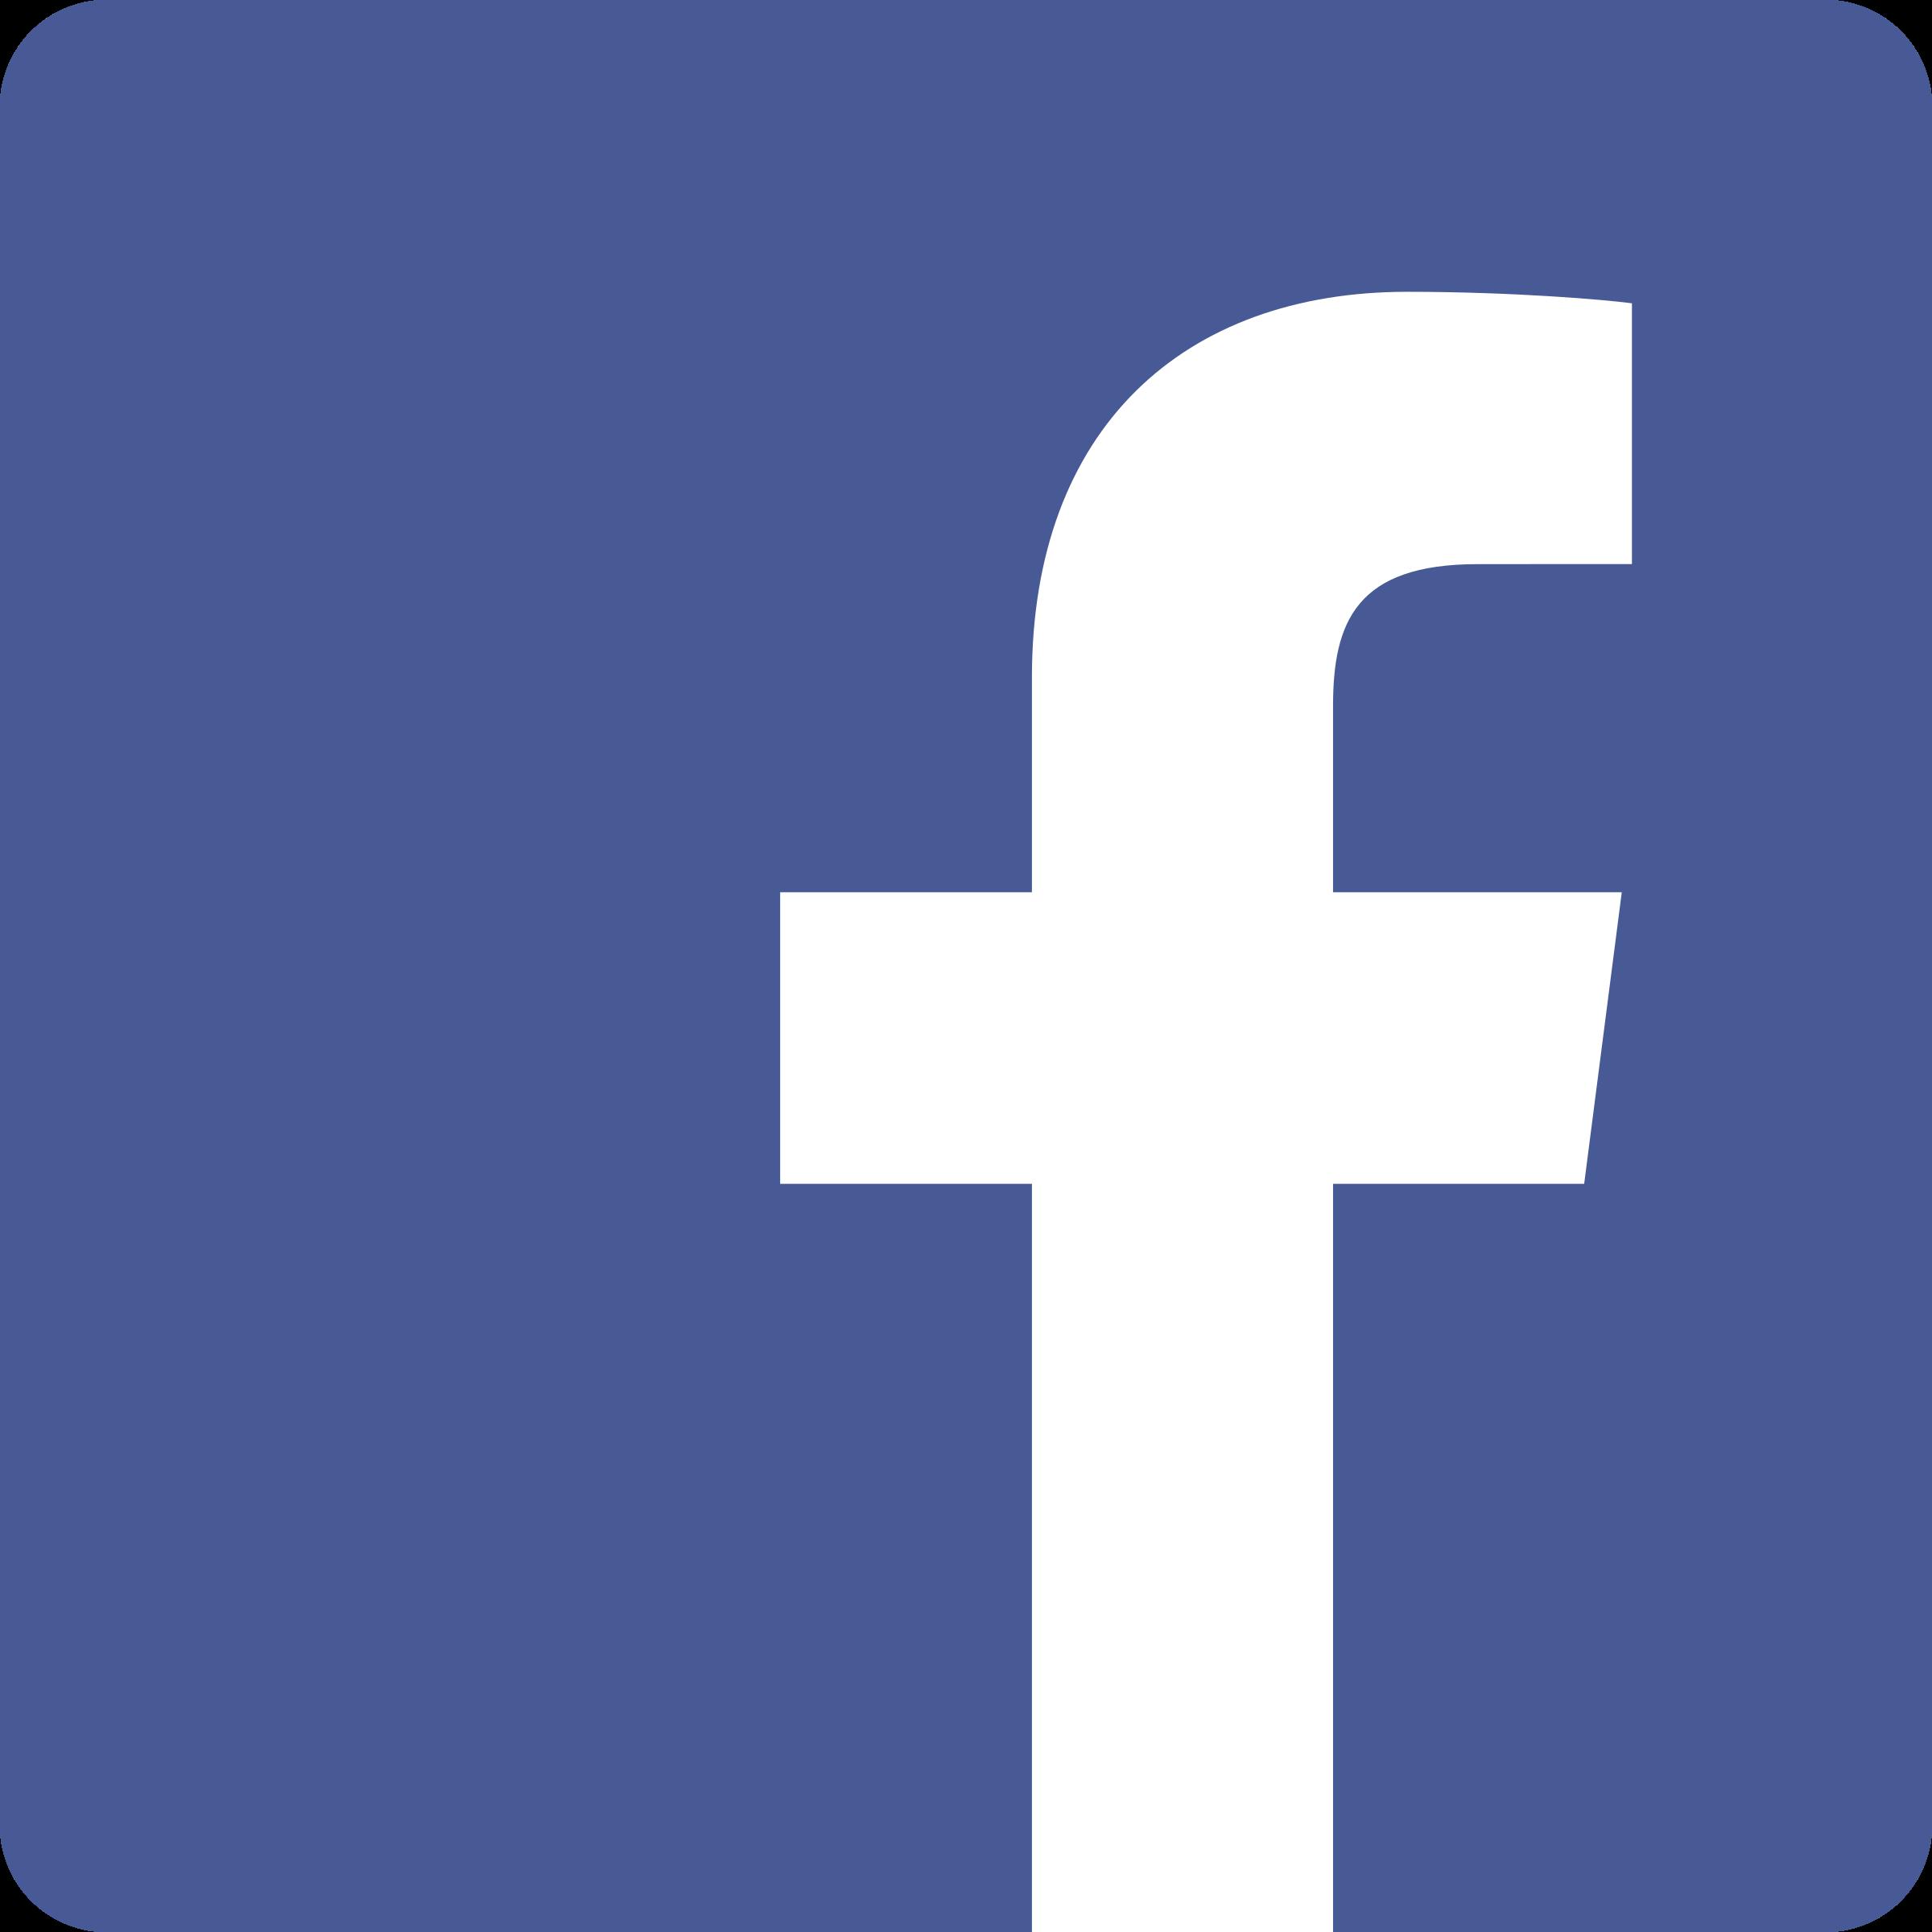 facebook-icon-logo-png-transparent